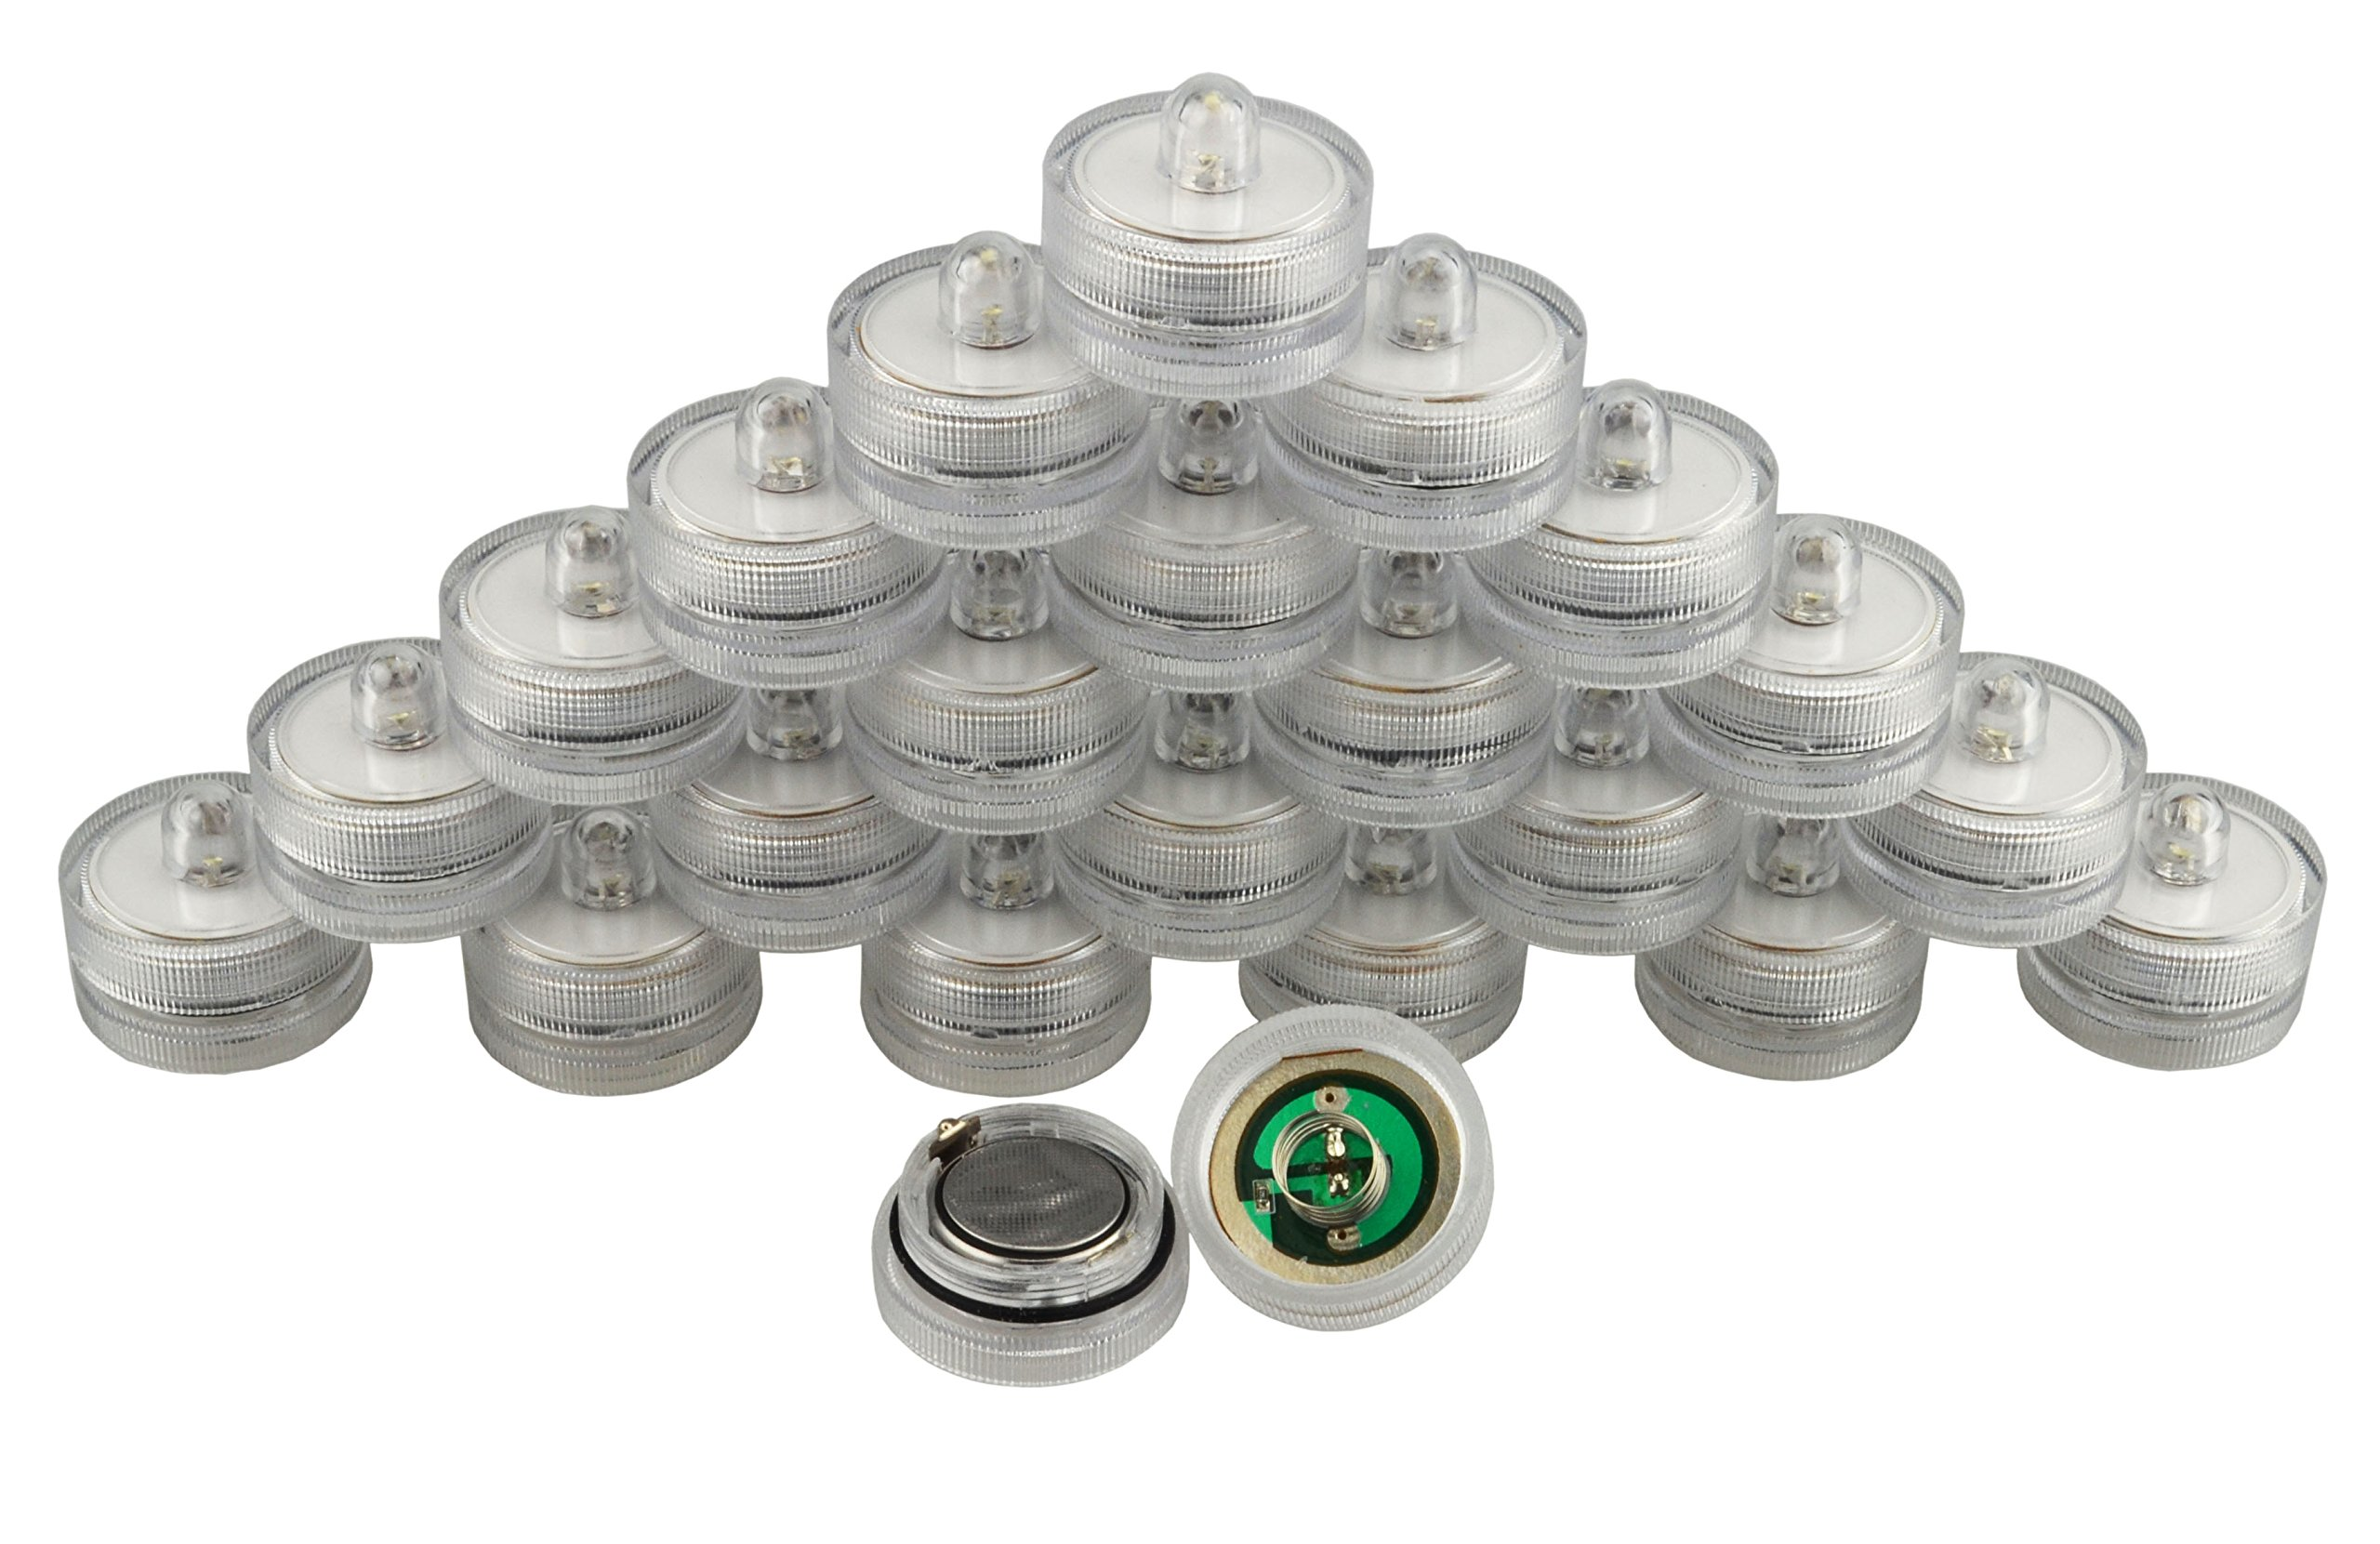 Samyo Set of 36 Waterproof Wedding Submersible Battery LED Tea Lights Underwater Sub Lights- Wedding Centerpieces Party Decorate (White) by Samyo (Image #7)